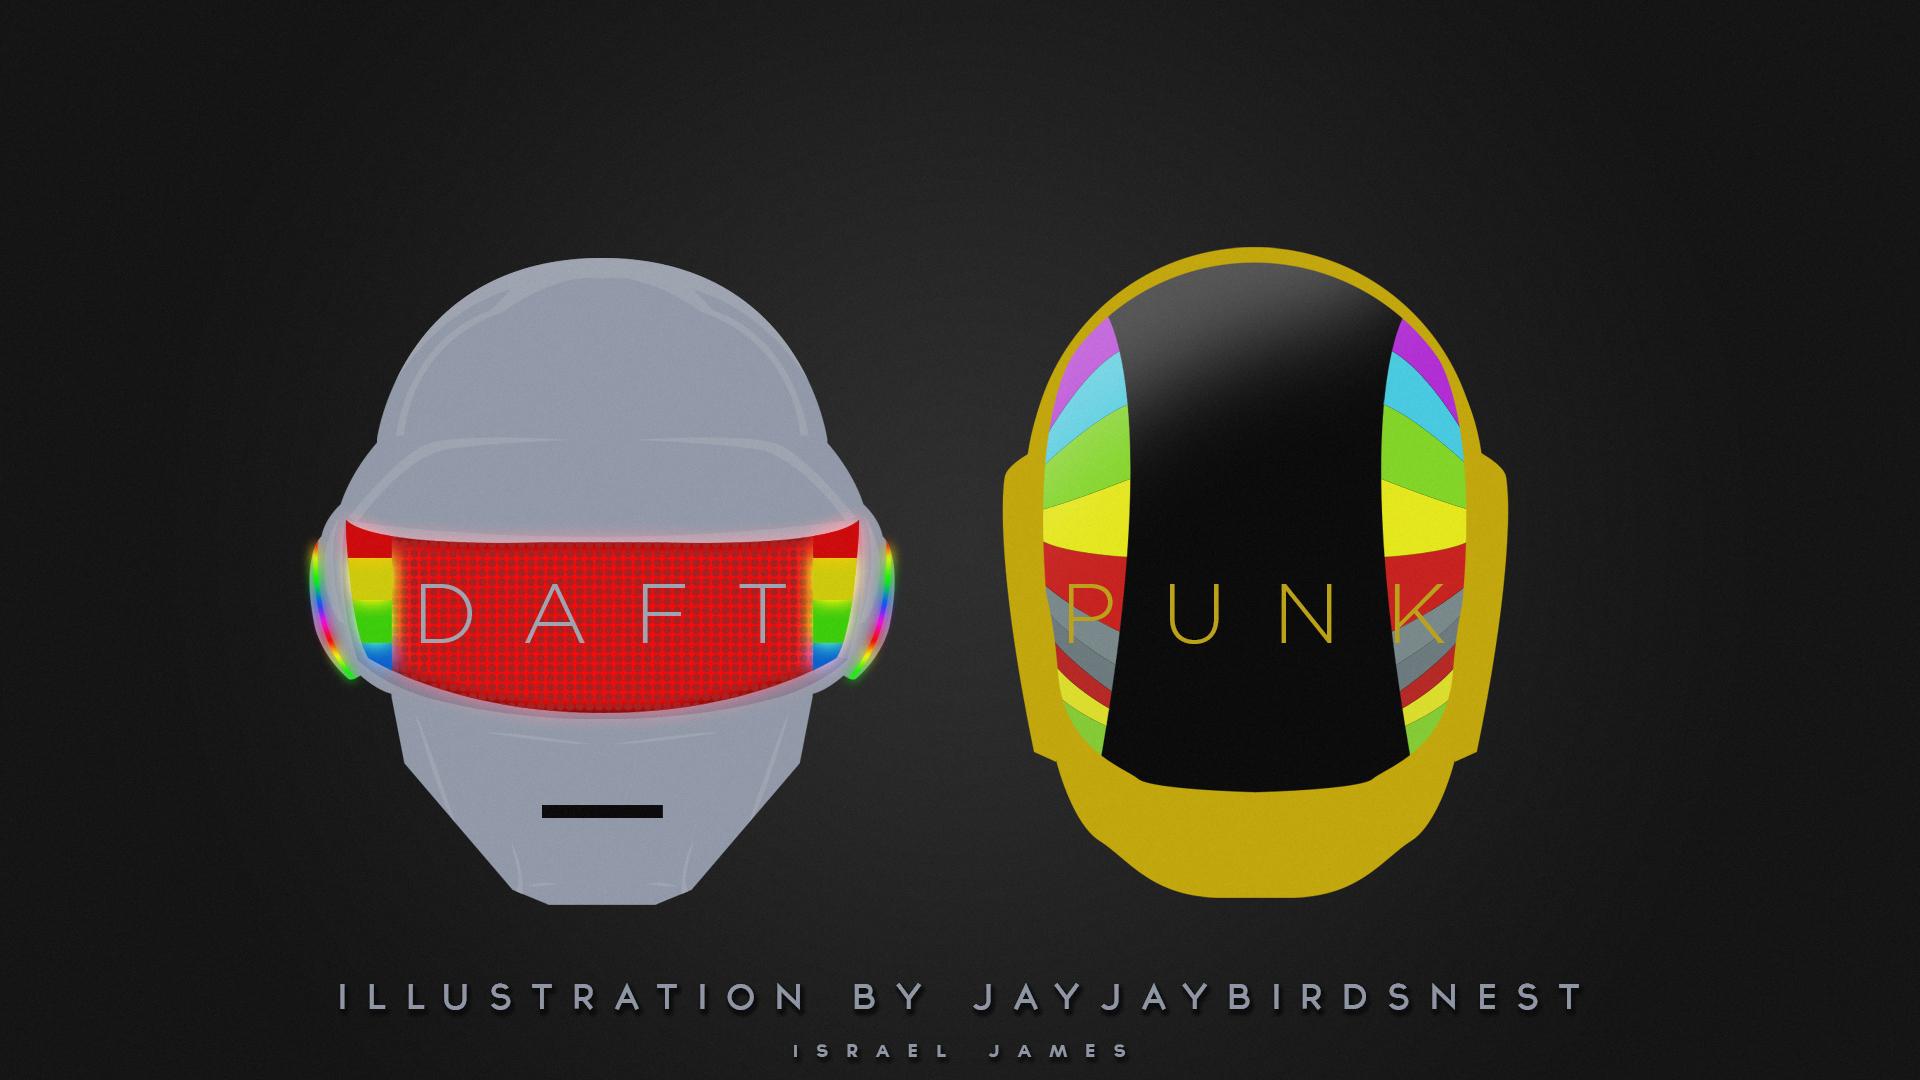 DAFT PUNK HELMETS ILLUSTRATION by jayjaybirdsnest on ...